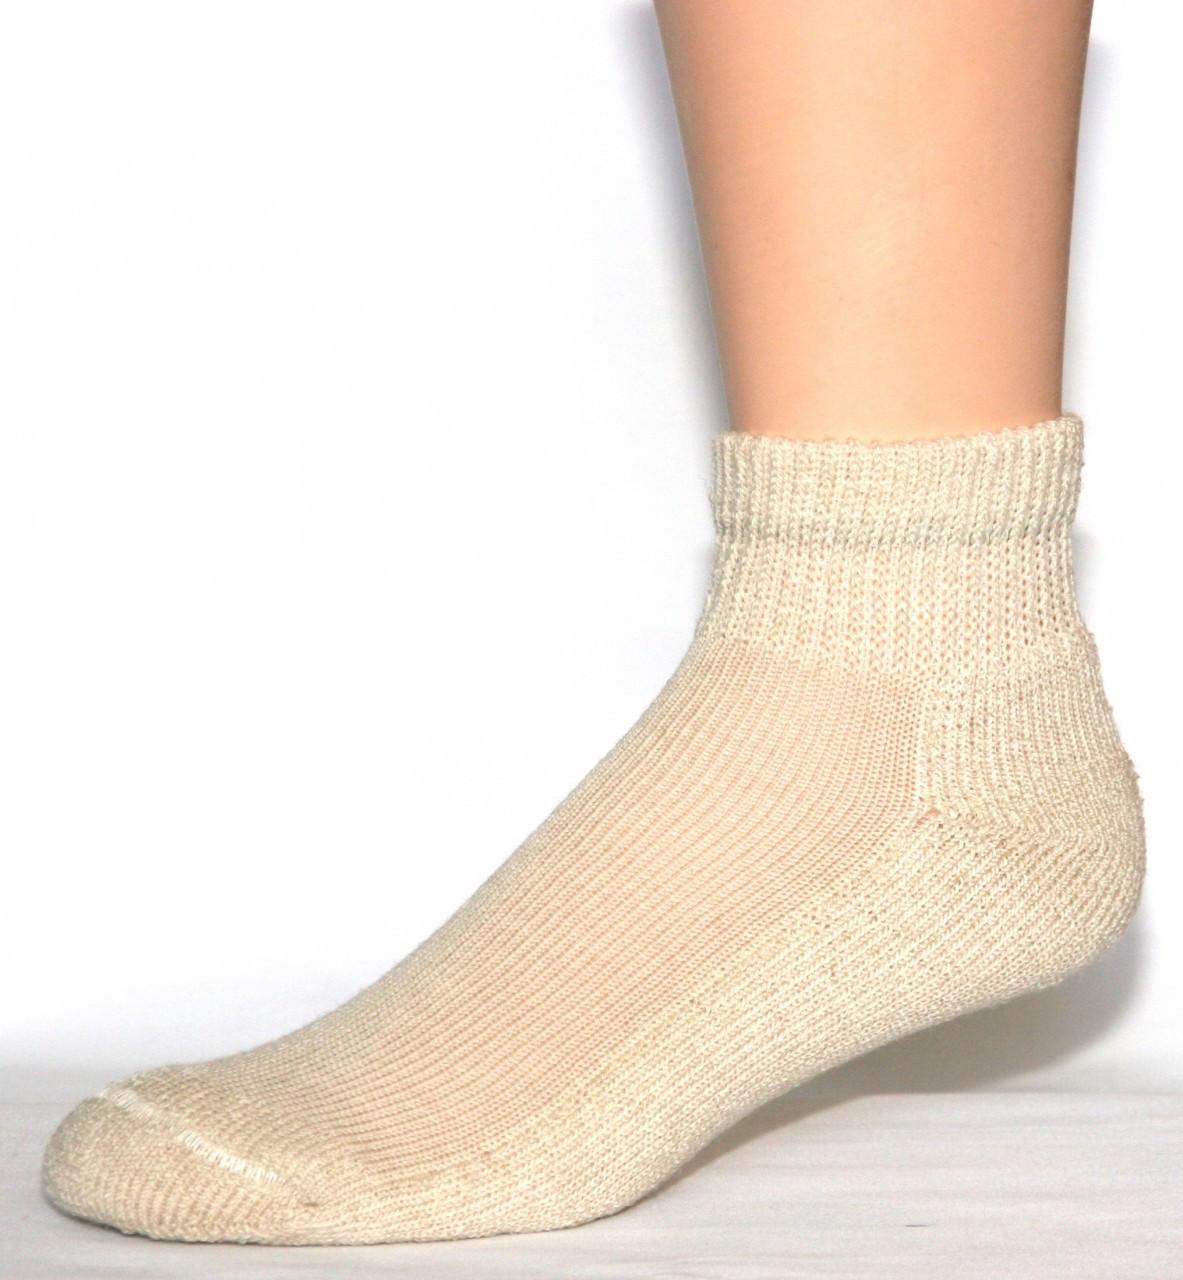 d823bfc5a8 Merino Wool Sport Socks - Motley Woollens Canada - Free Shipping